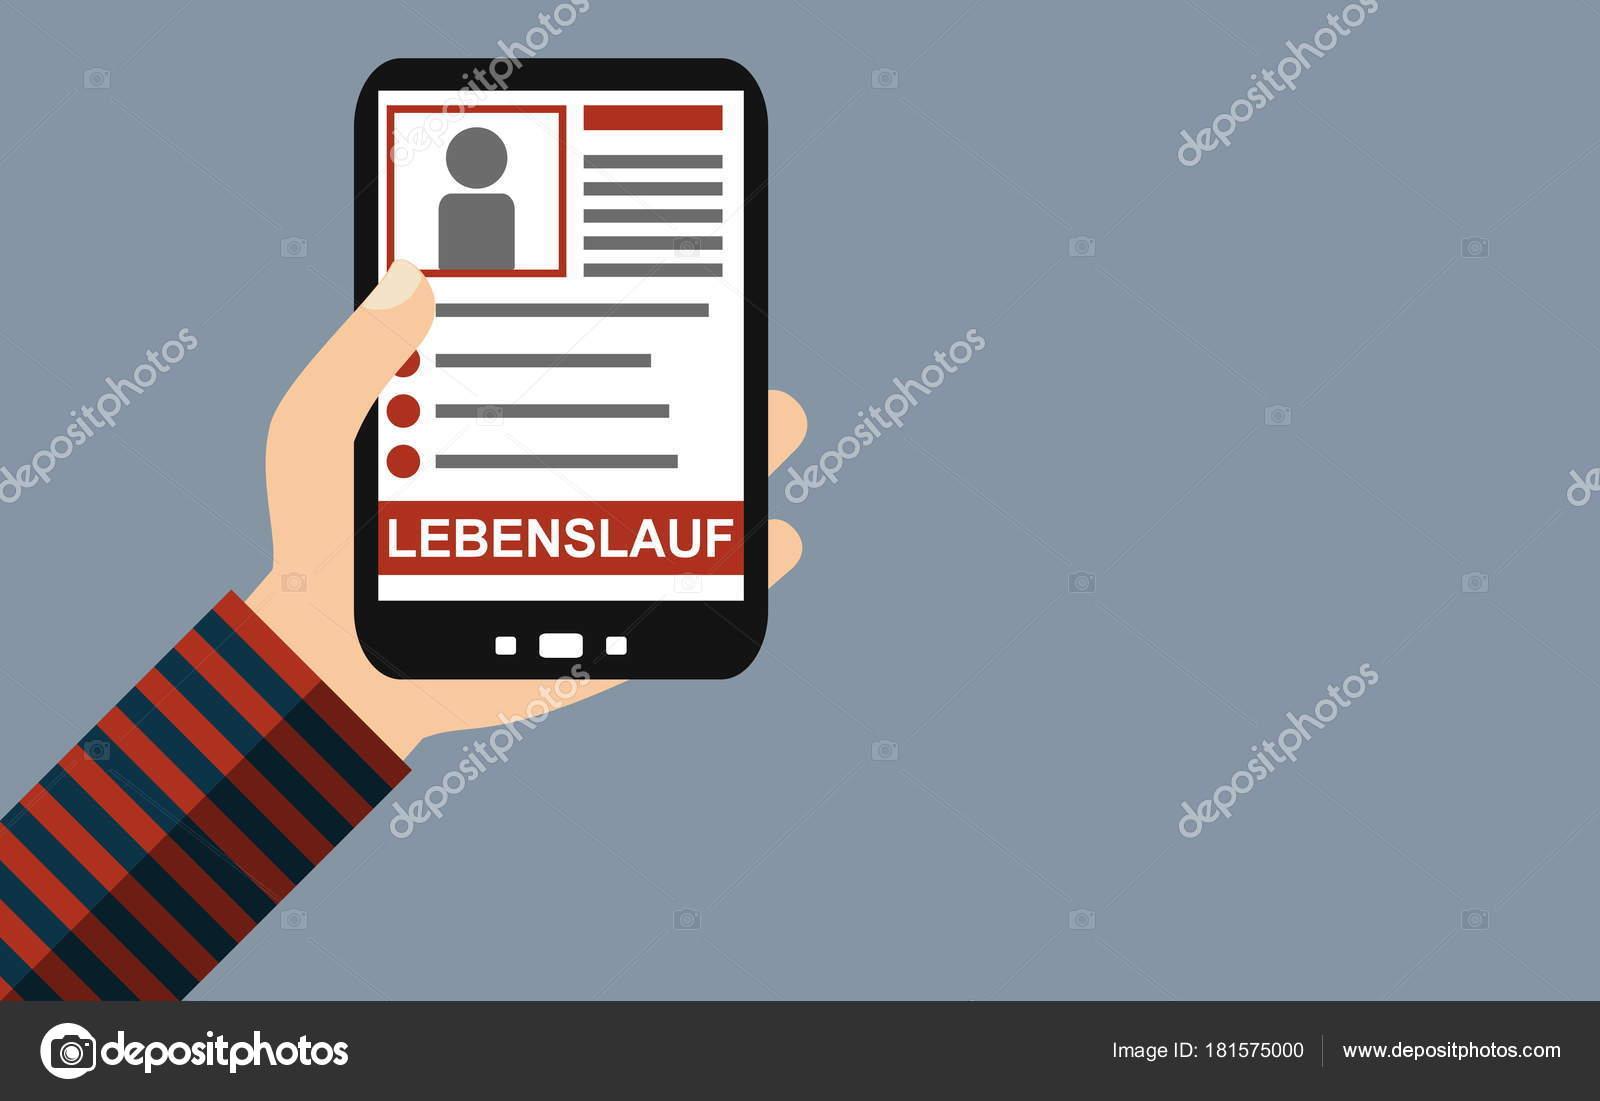 Smartphone Curriculum Vitae German Flat Design Stock Photo